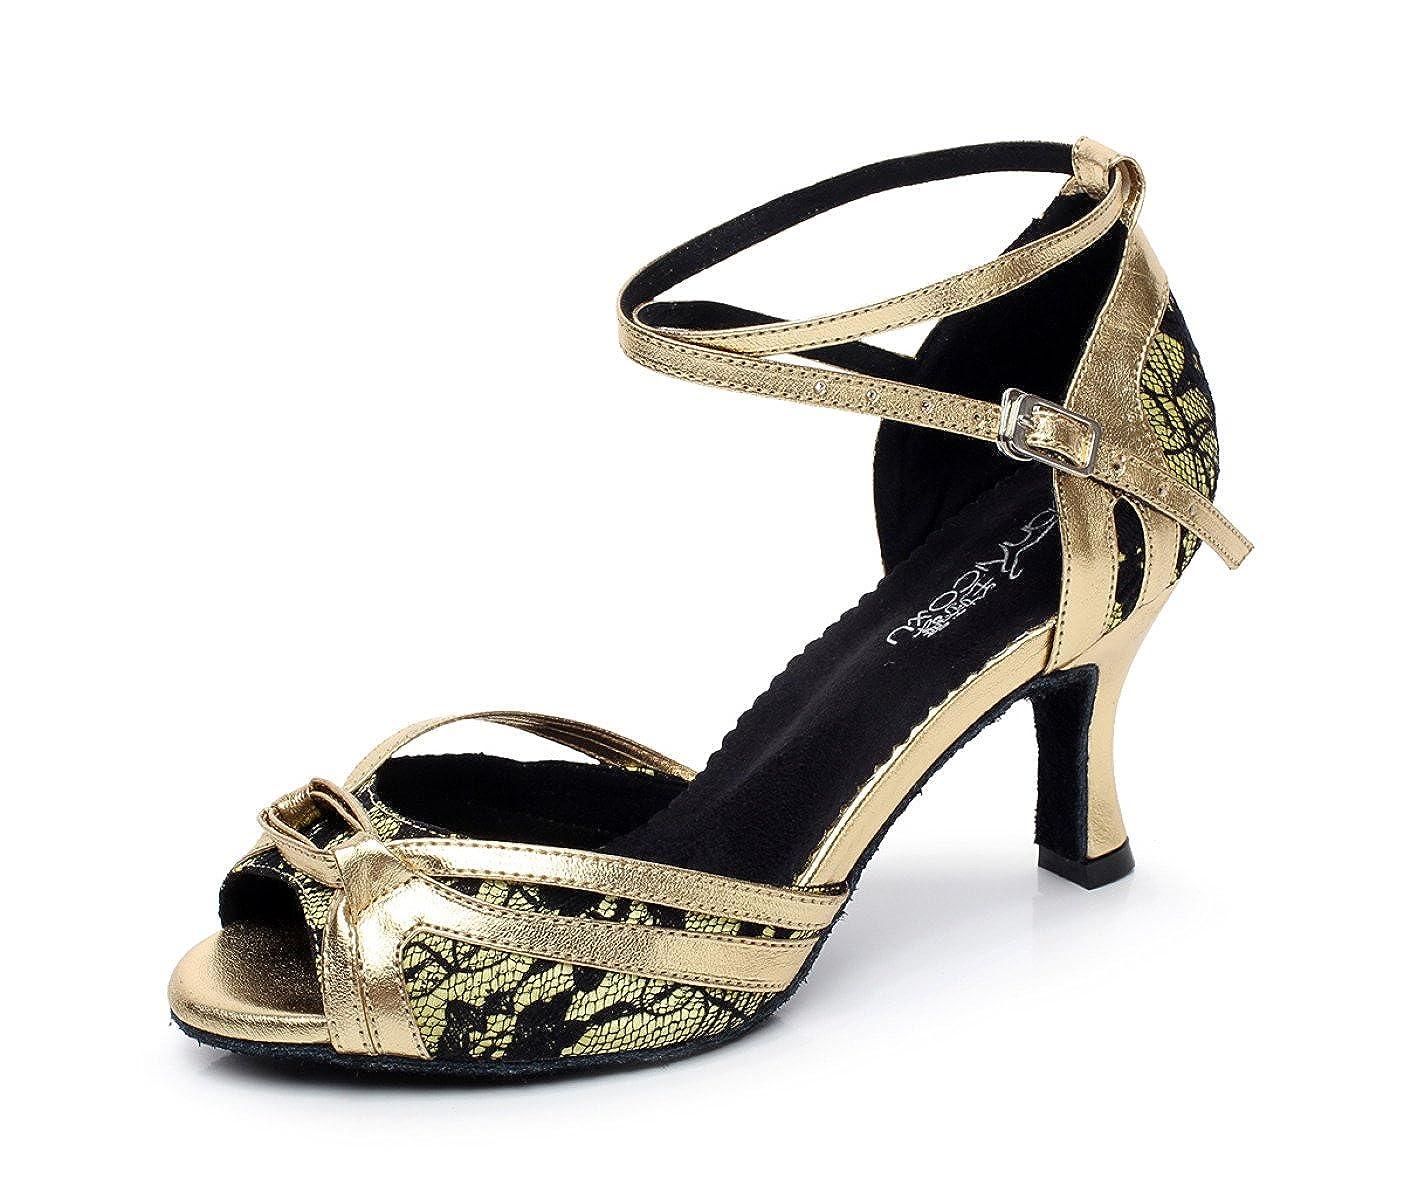 JSHOE Chaussures De Danse Pour JSHOE Sandales 19471 Femme Latin Salsa/Tango/Thé/Samba/Moderne/Jazz Chaussures Sandales Talons Hauts,Gold-heeled6cm-UK7/EU41/Our42 - a5e4e16 - reprogrammed.space